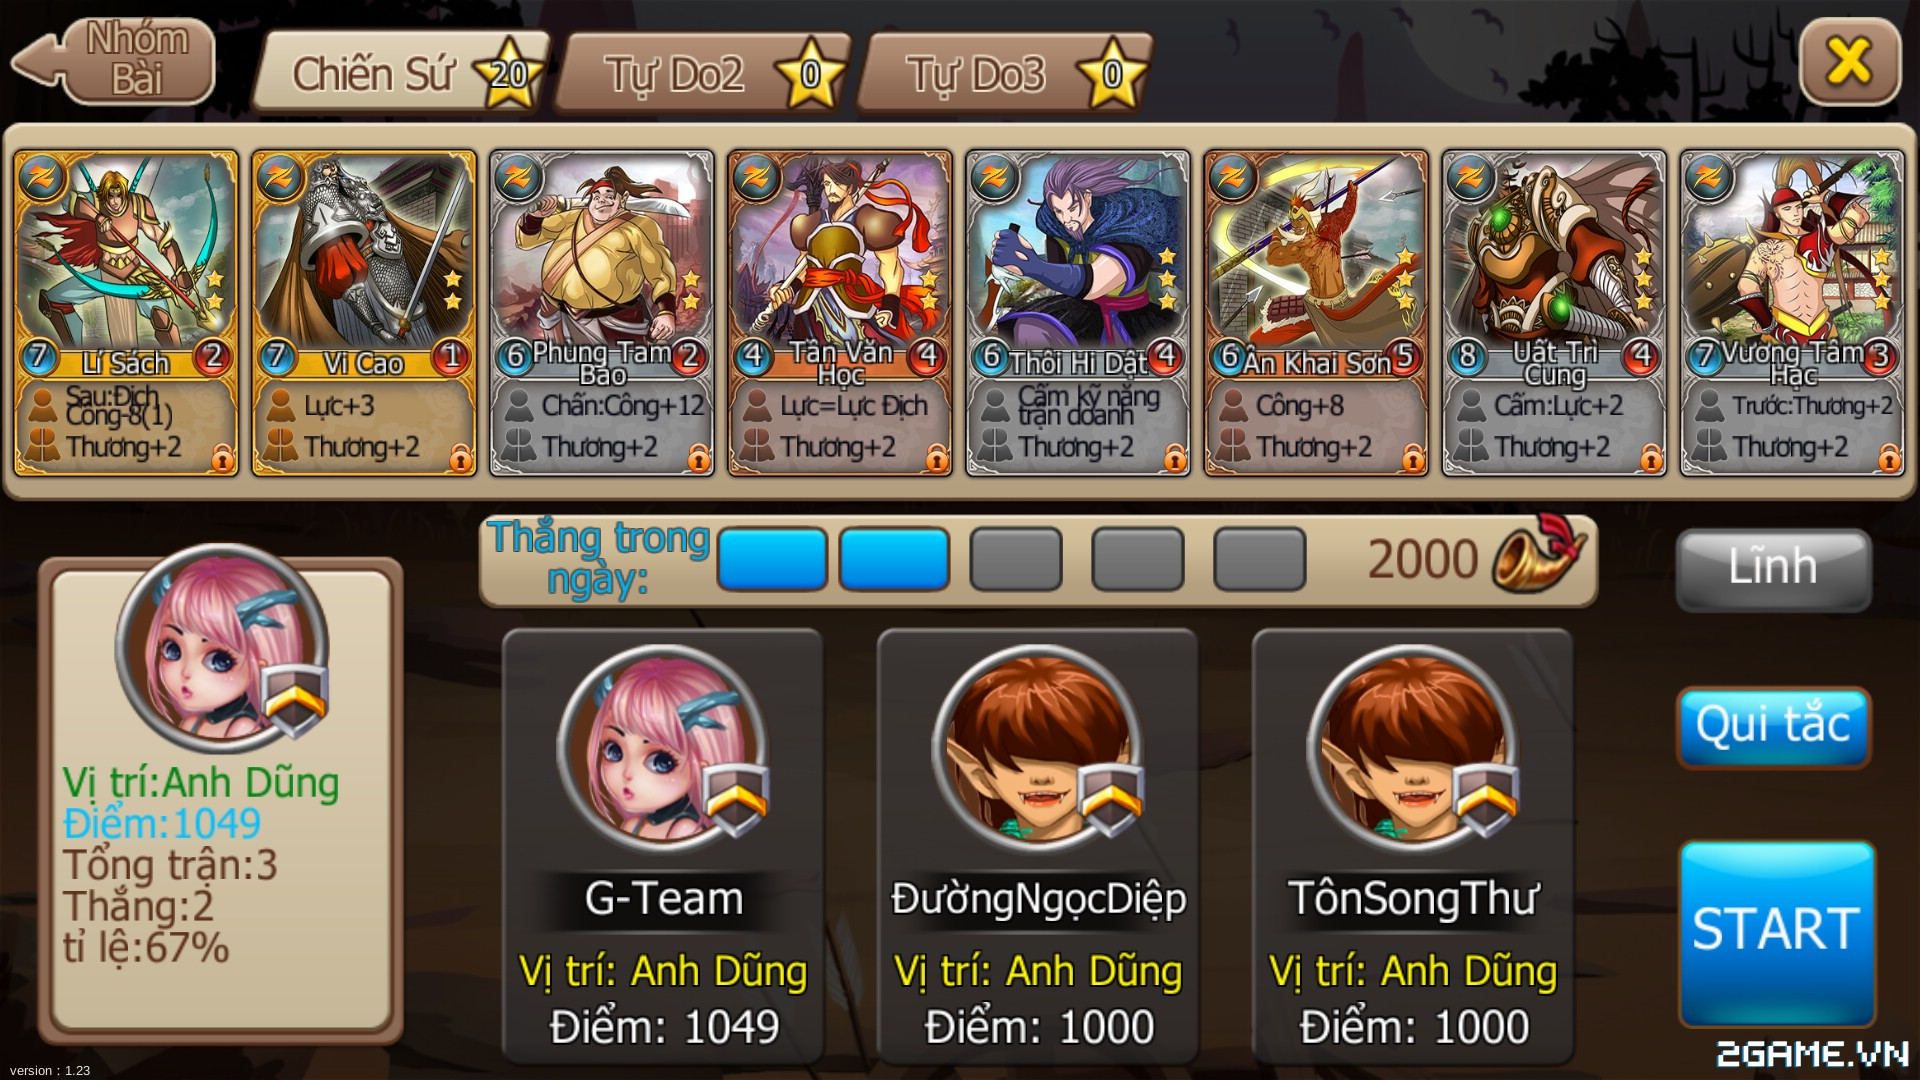 Tặng 310 giftcode game Tề Thiên Mobile 2